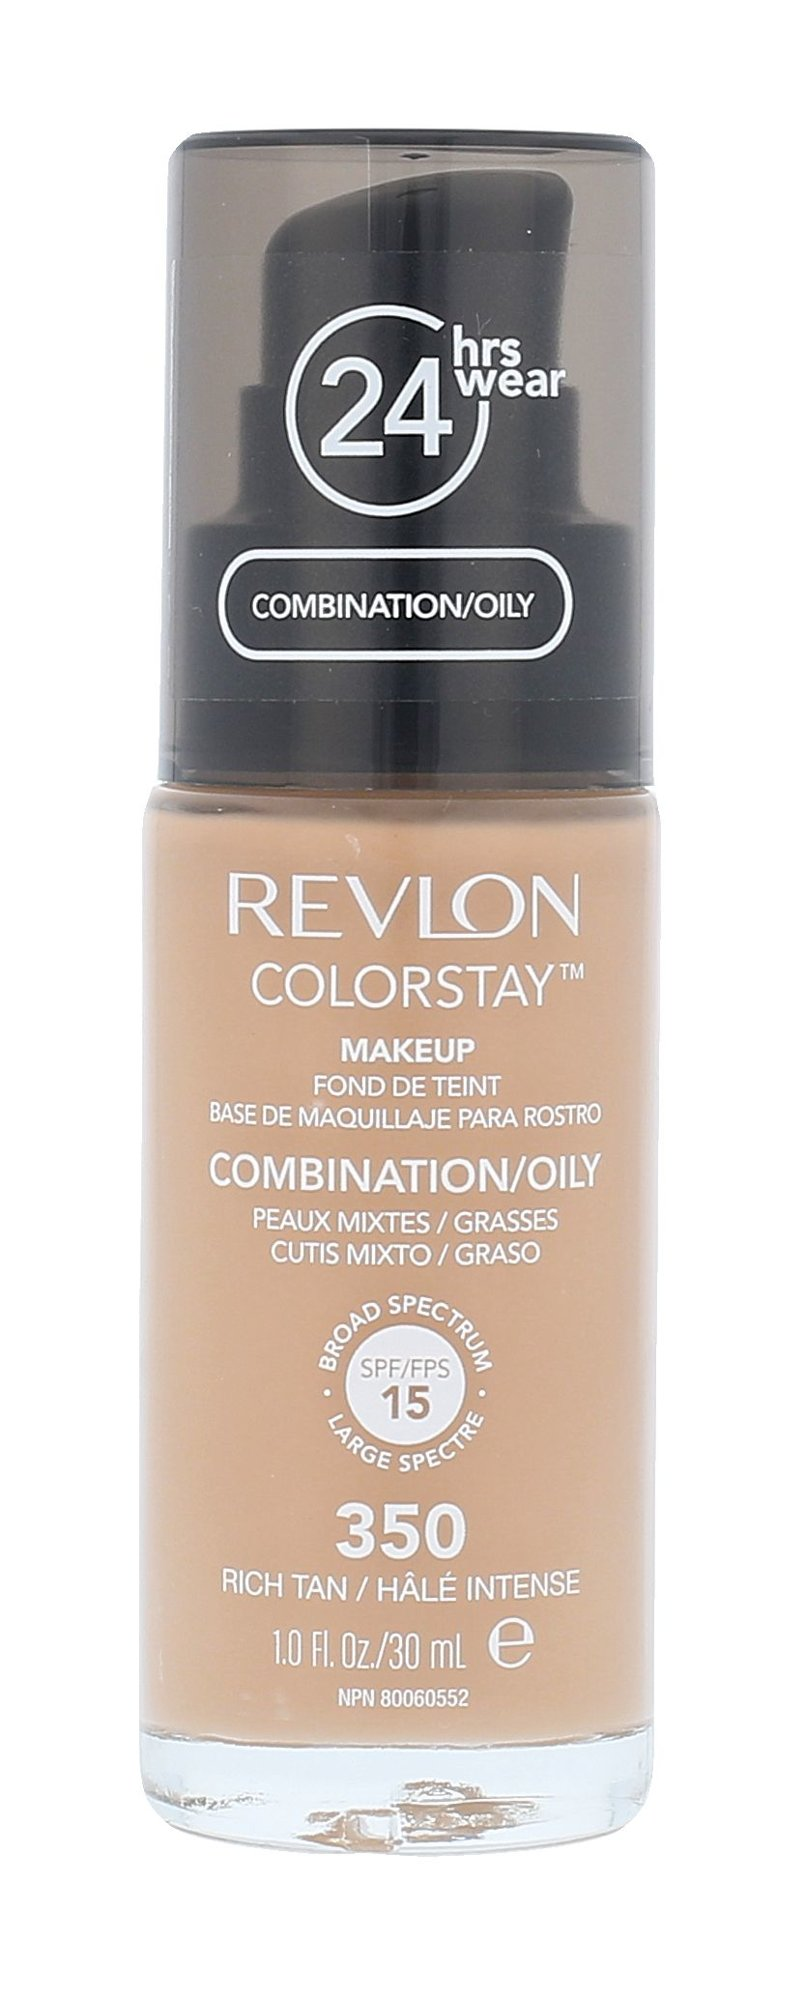 Revlon Colorstay Cosmetic 30ml 350 Rich Tan